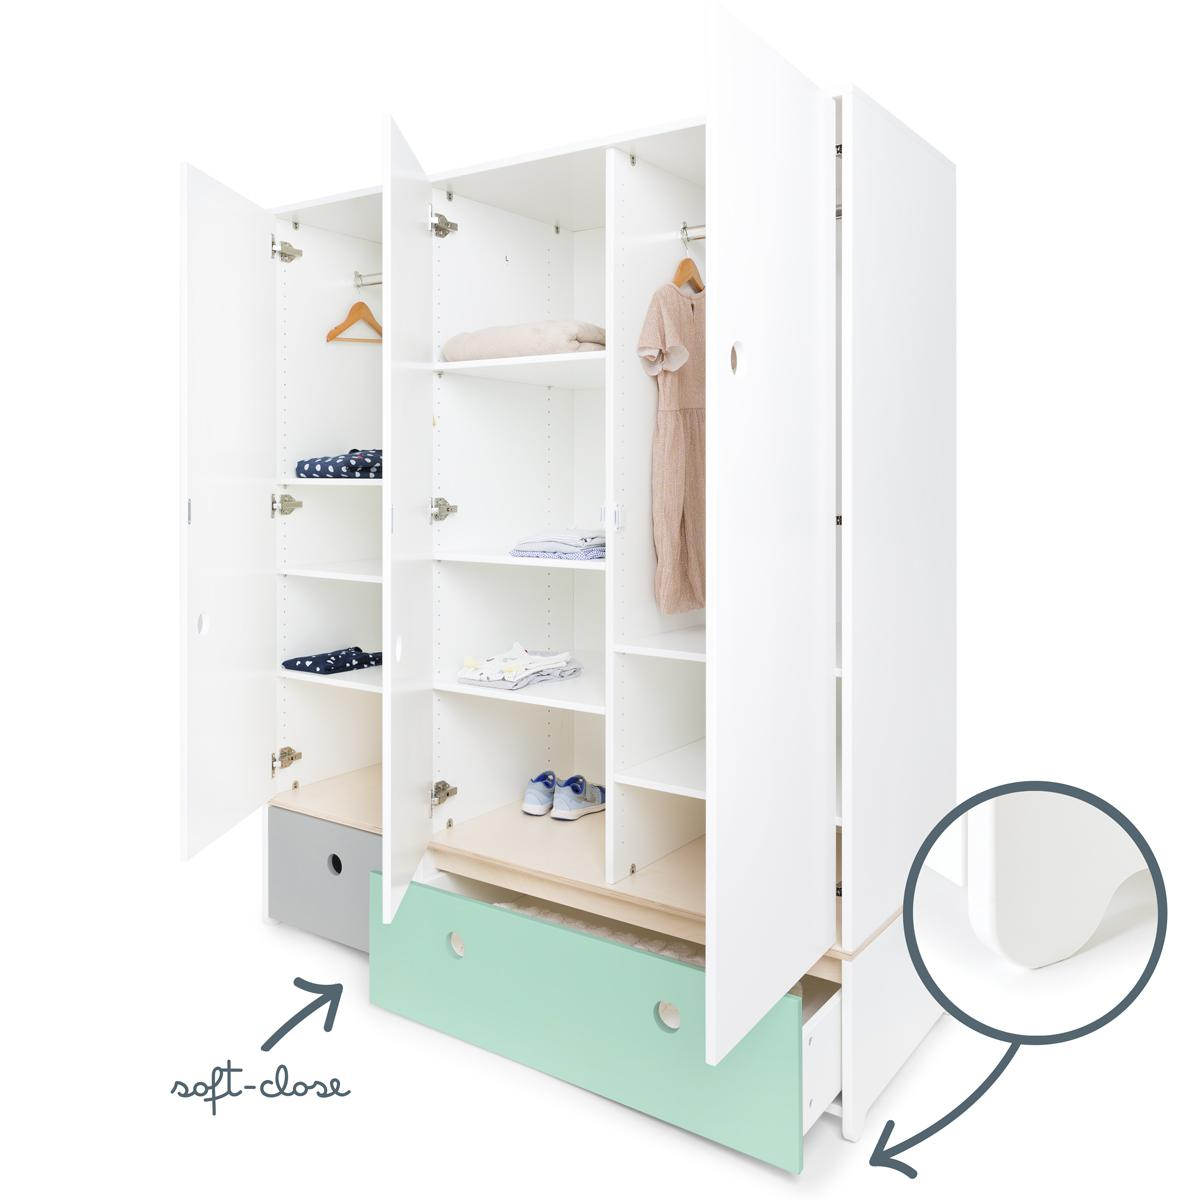 Kleiderschrank 3-türig COLORFLEX Schubladen pearl grey-mint